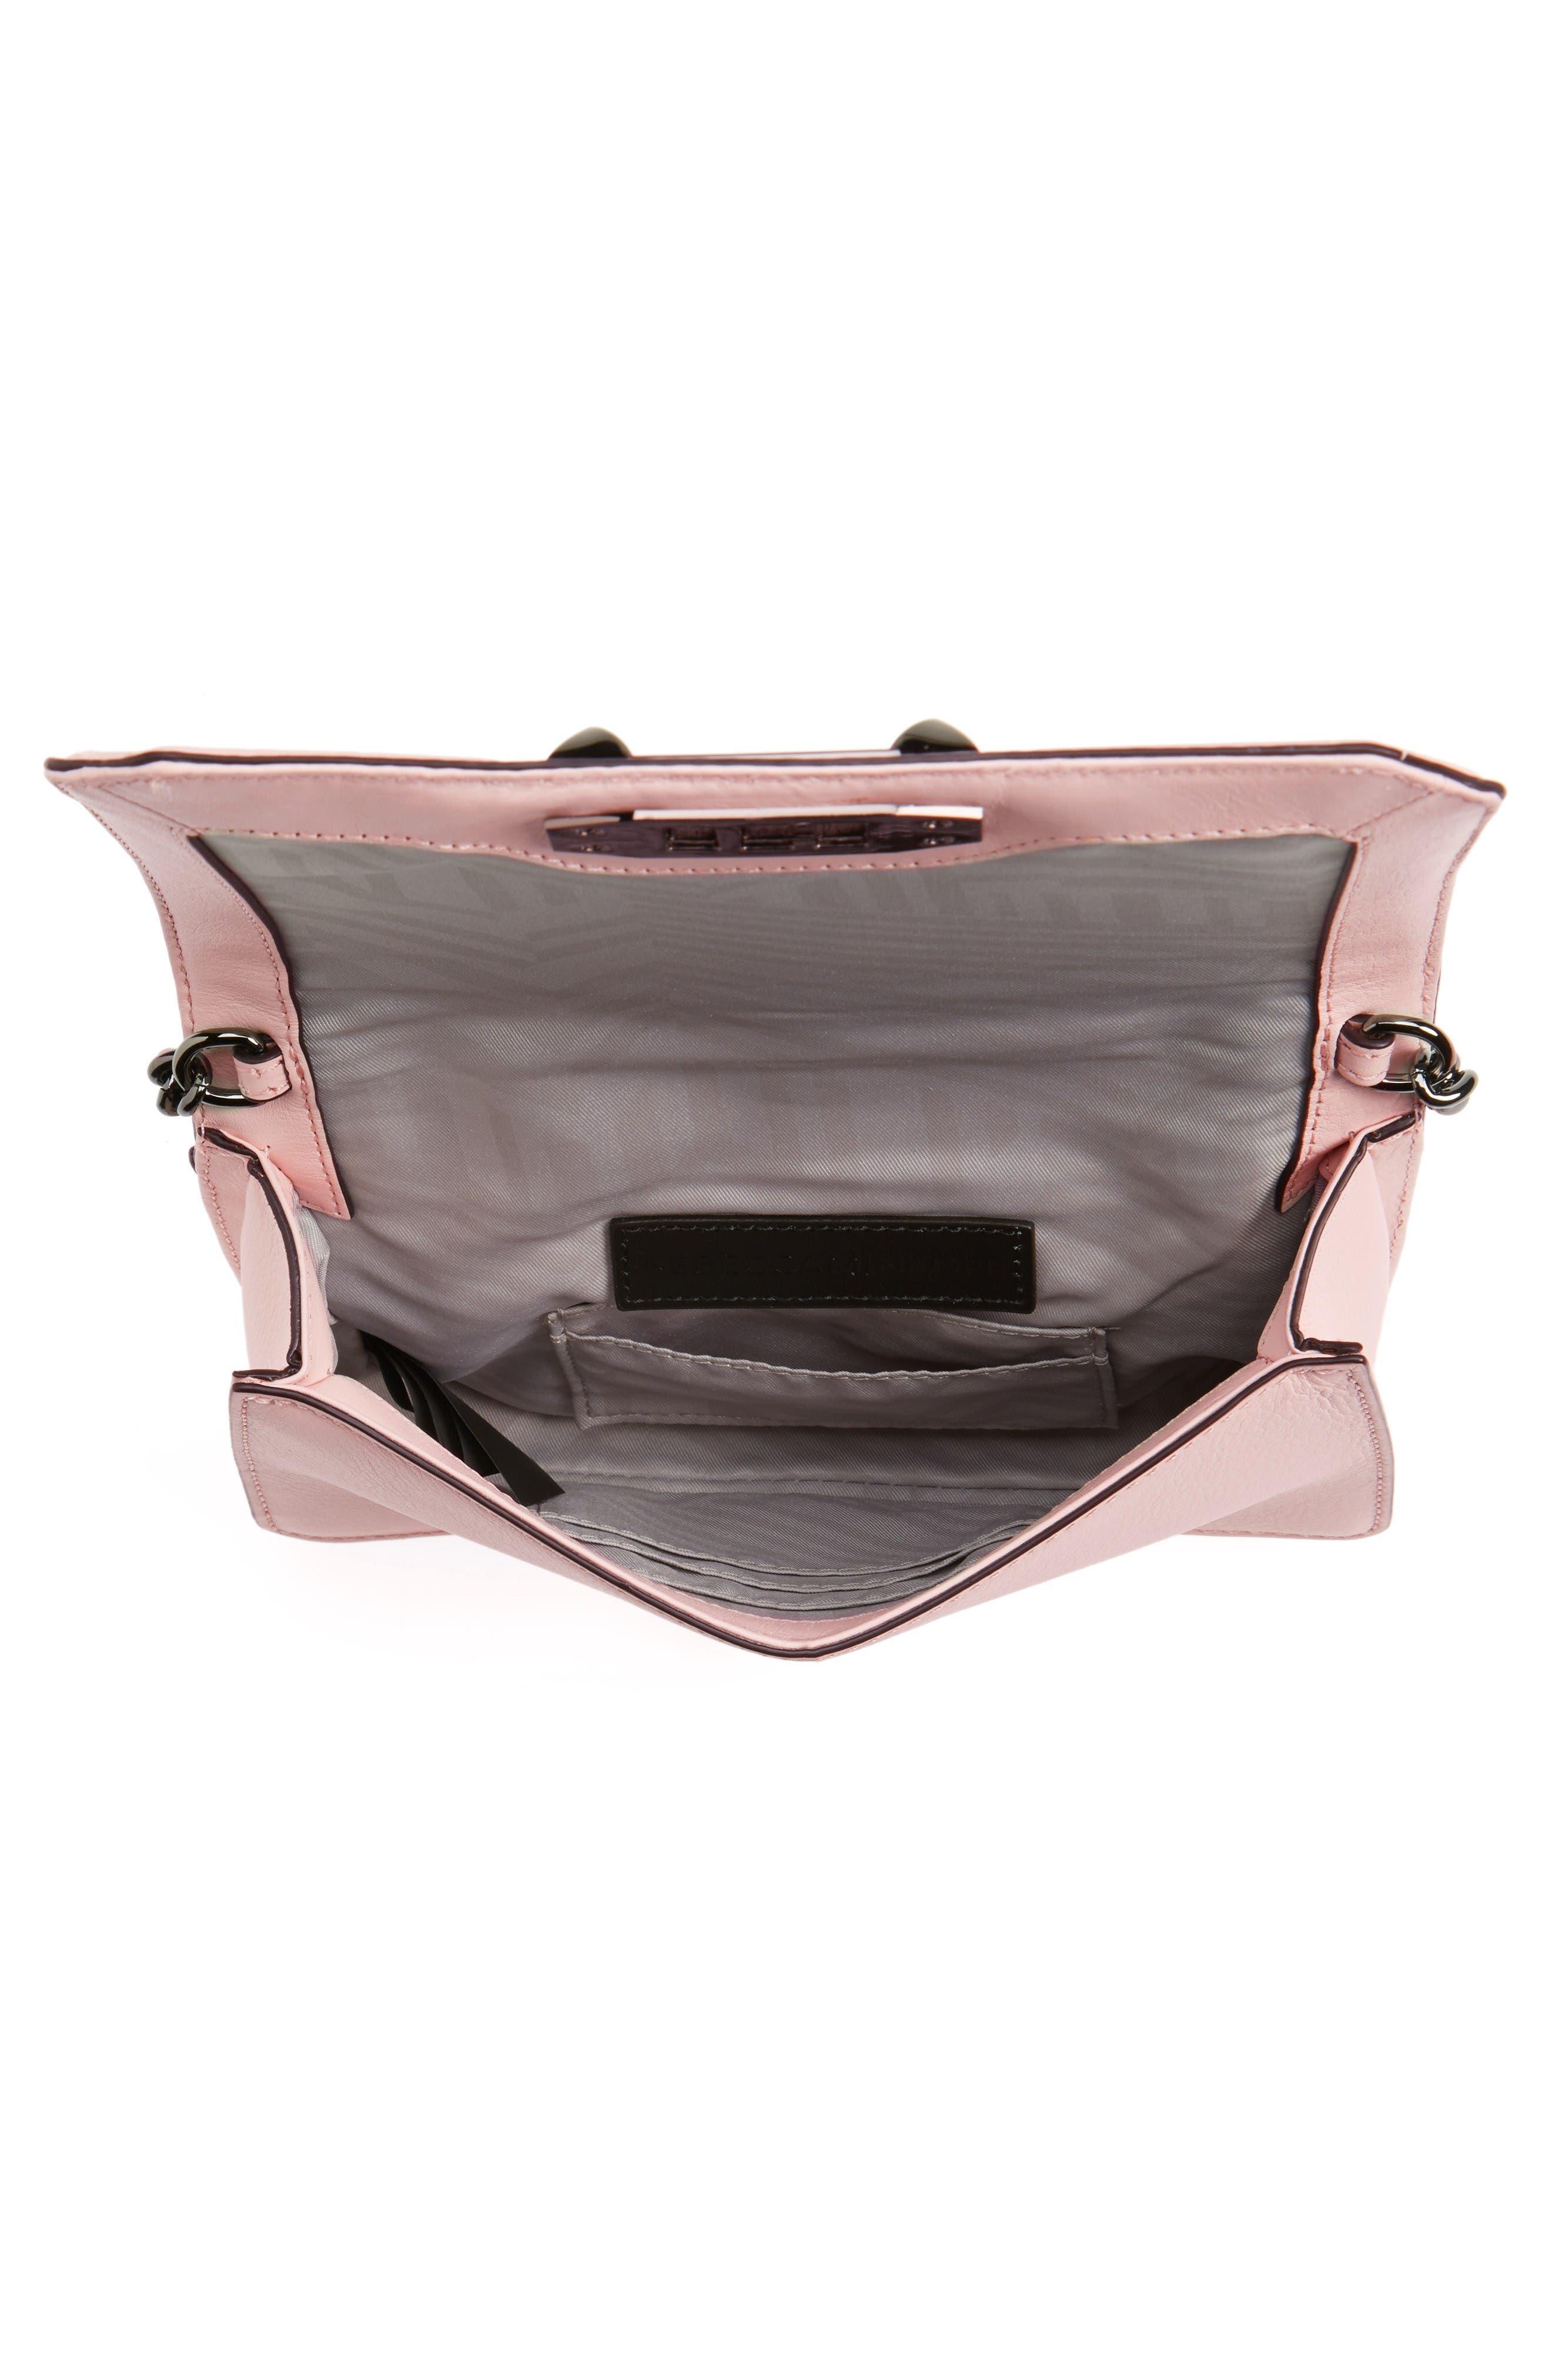 Small Love Leather Crossbody Bag,                             Alternate thumbnail 4, color,                             Soft Blush/ Gunmetal